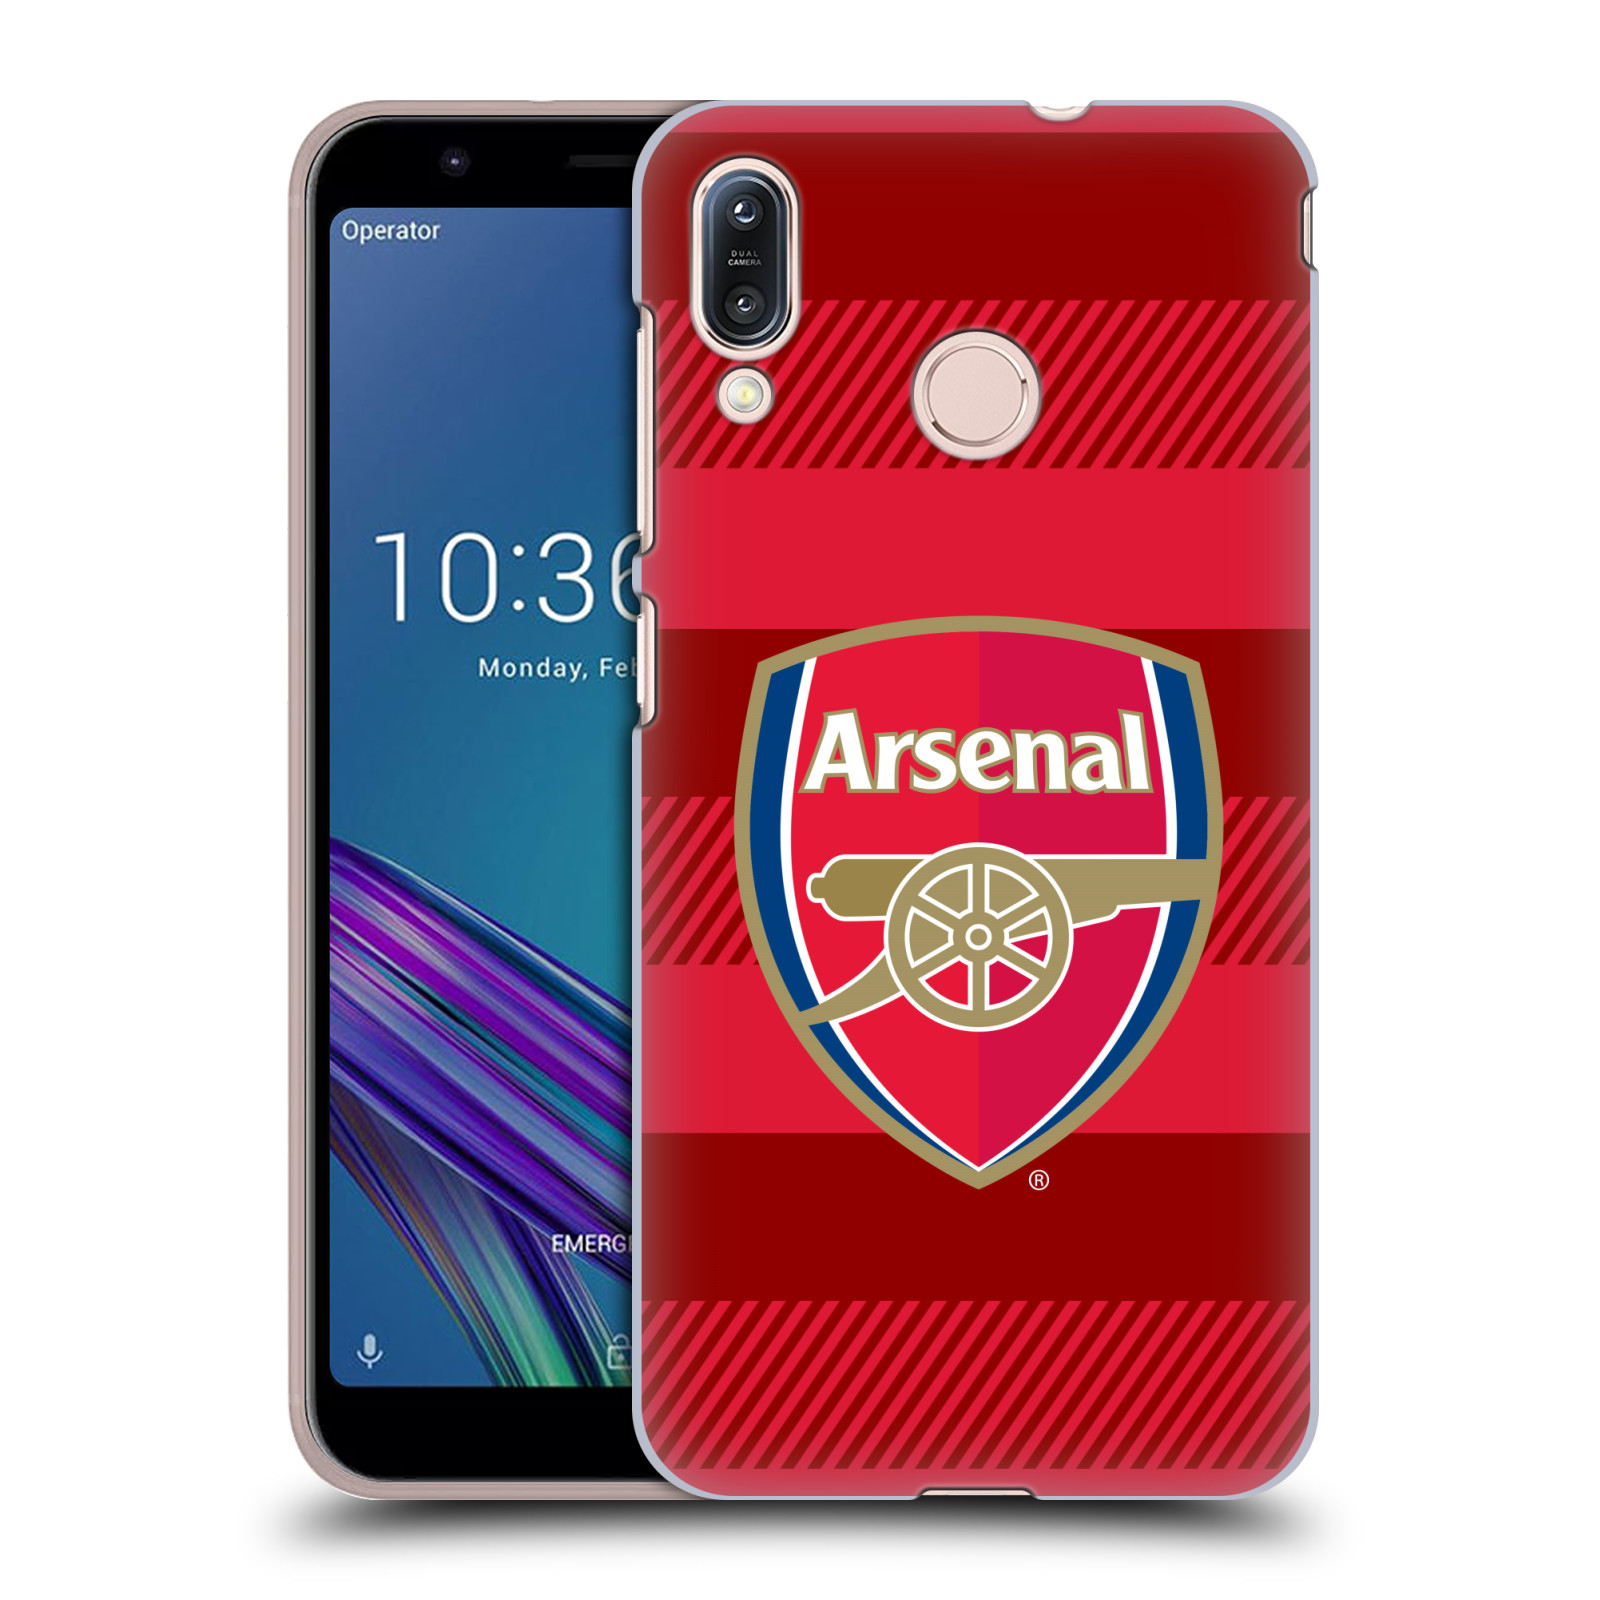 Plastové pouzdro na mobil Asus Zenfone Max M1 ZB555KL - Head Case - Arsenal FC - Logo s pruhy